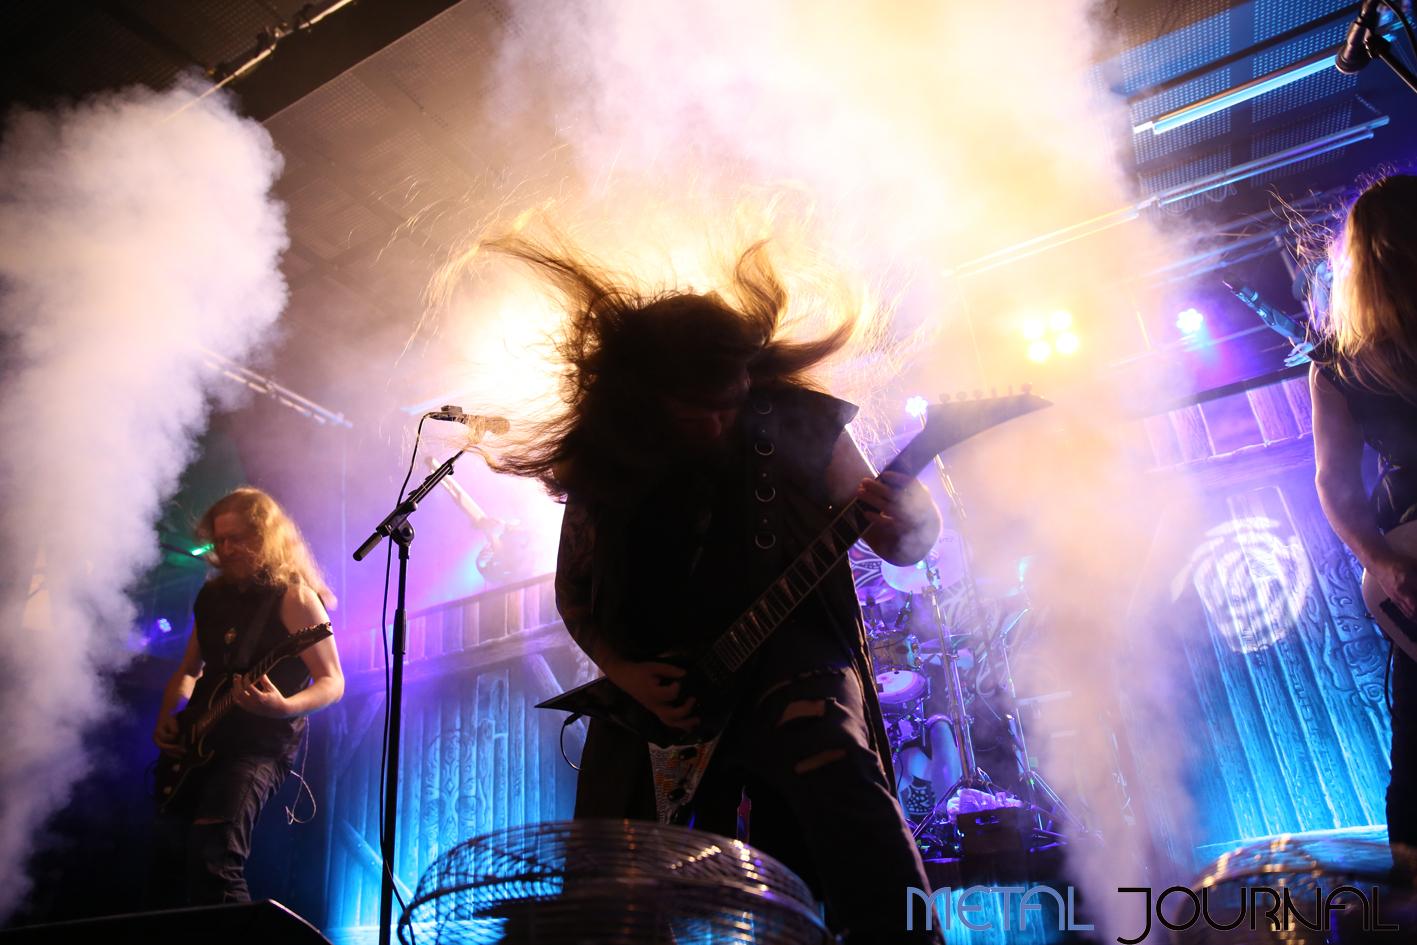 orden ogan - metal journal 2017 pic 1